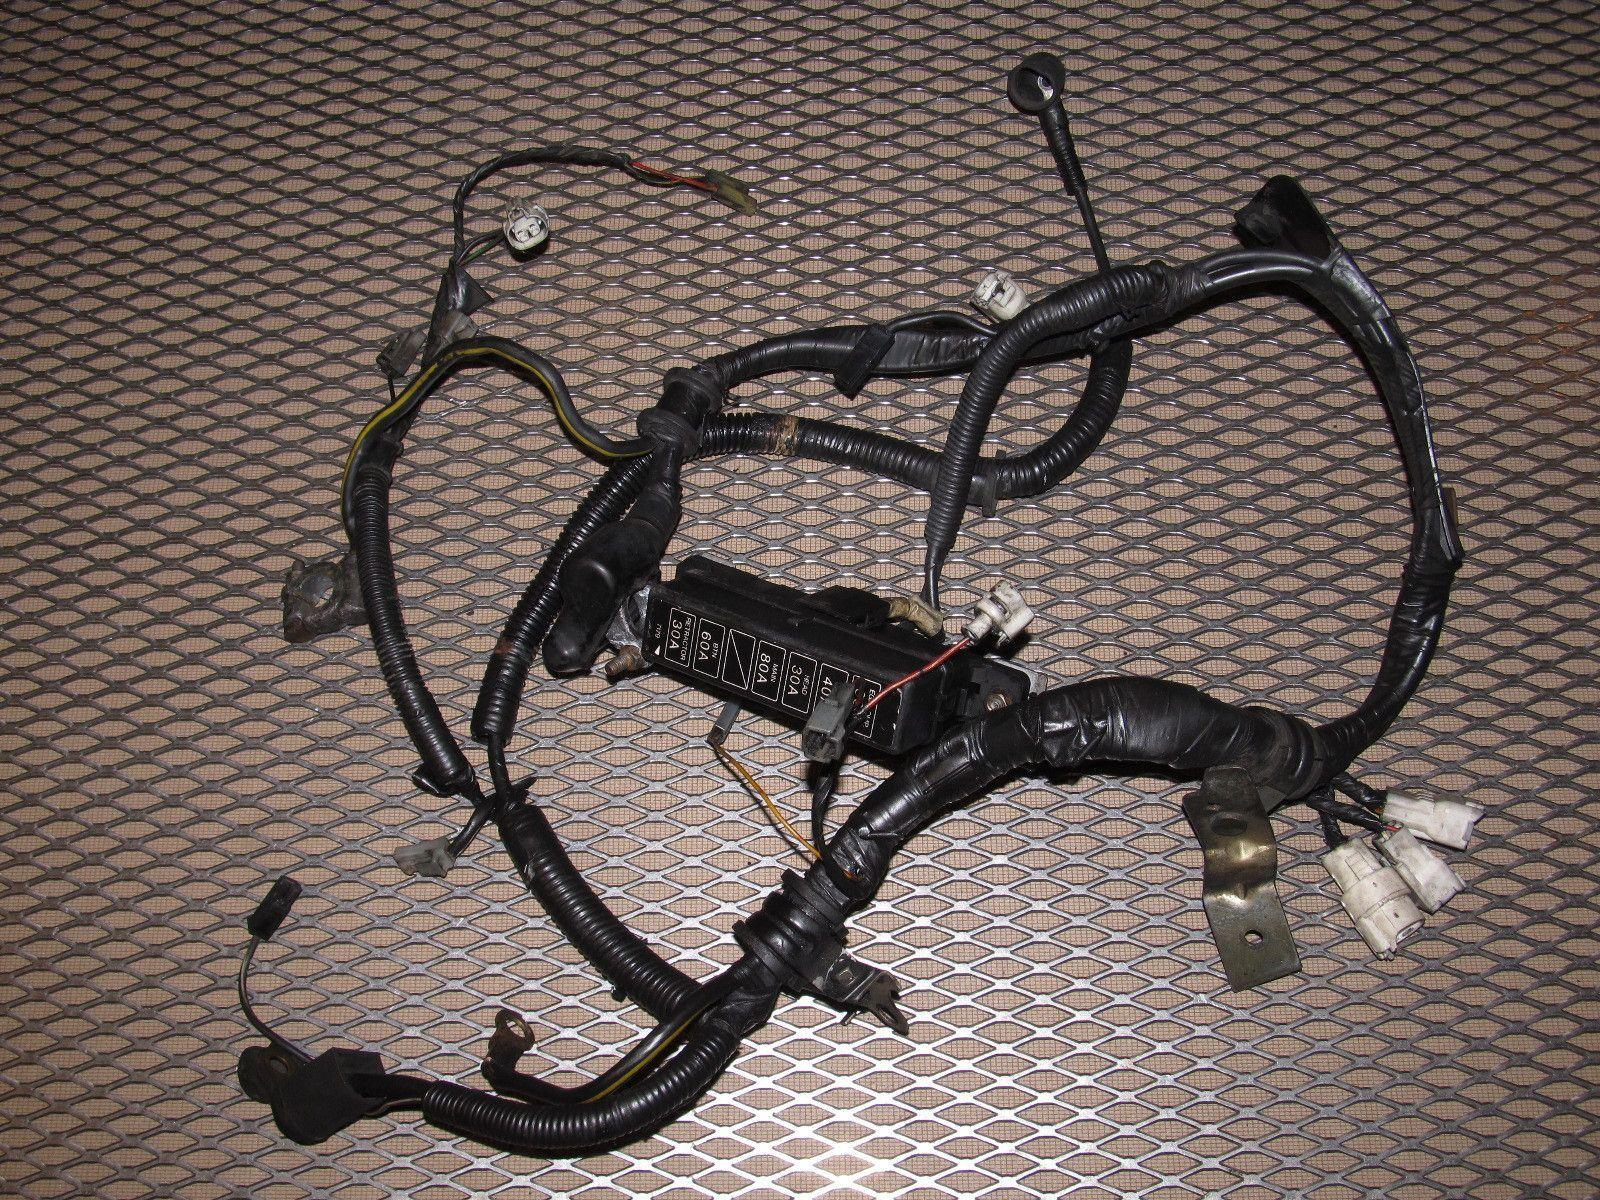 86 87 88 mazda rx7 oem m t transmission wiring harness products 86 87 88 mazda rx7 oem m t transmission wiring harness